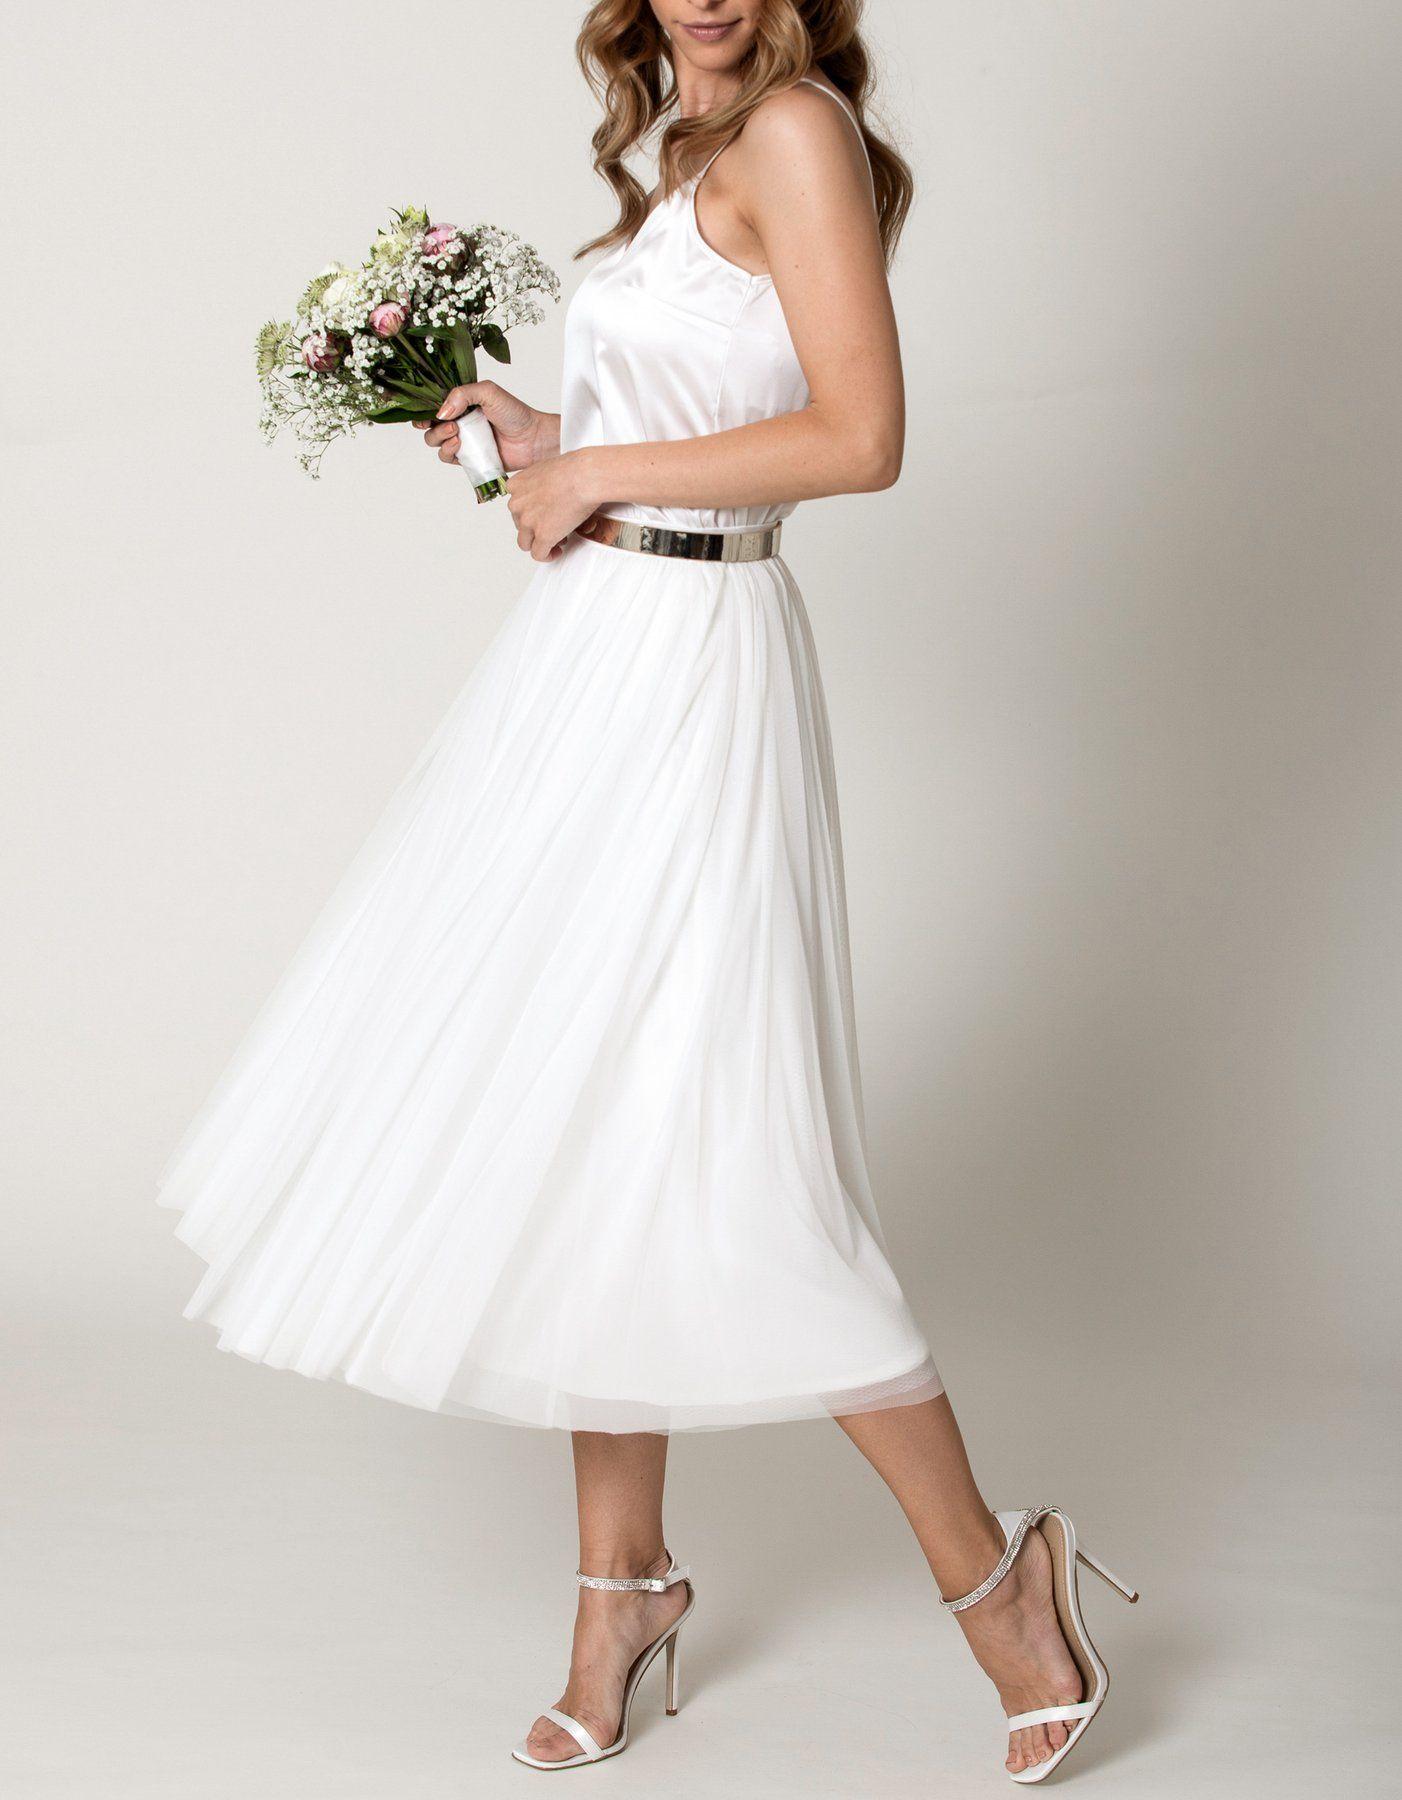 CONSTANT LOVE Tüll Rock Midi Wadenlang Braut Hochzeitskleid